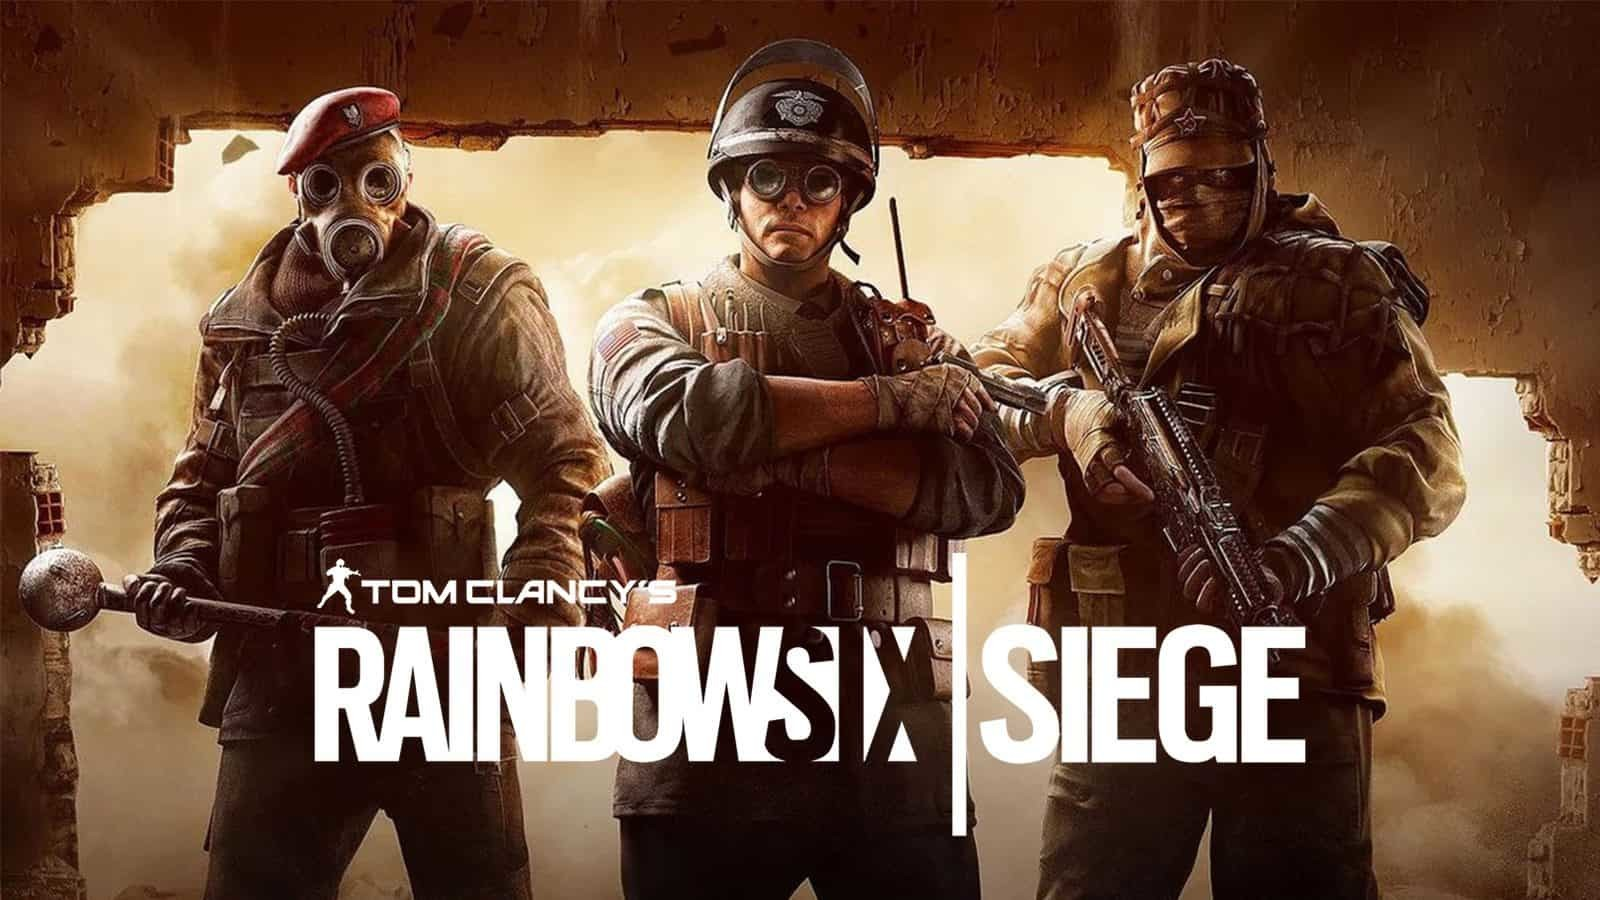 Photo of لعبة Rainbow Six: Siege مجانية لفترة محدودة في هذه التواريخ احتفالاً بالمحتوى الجديد